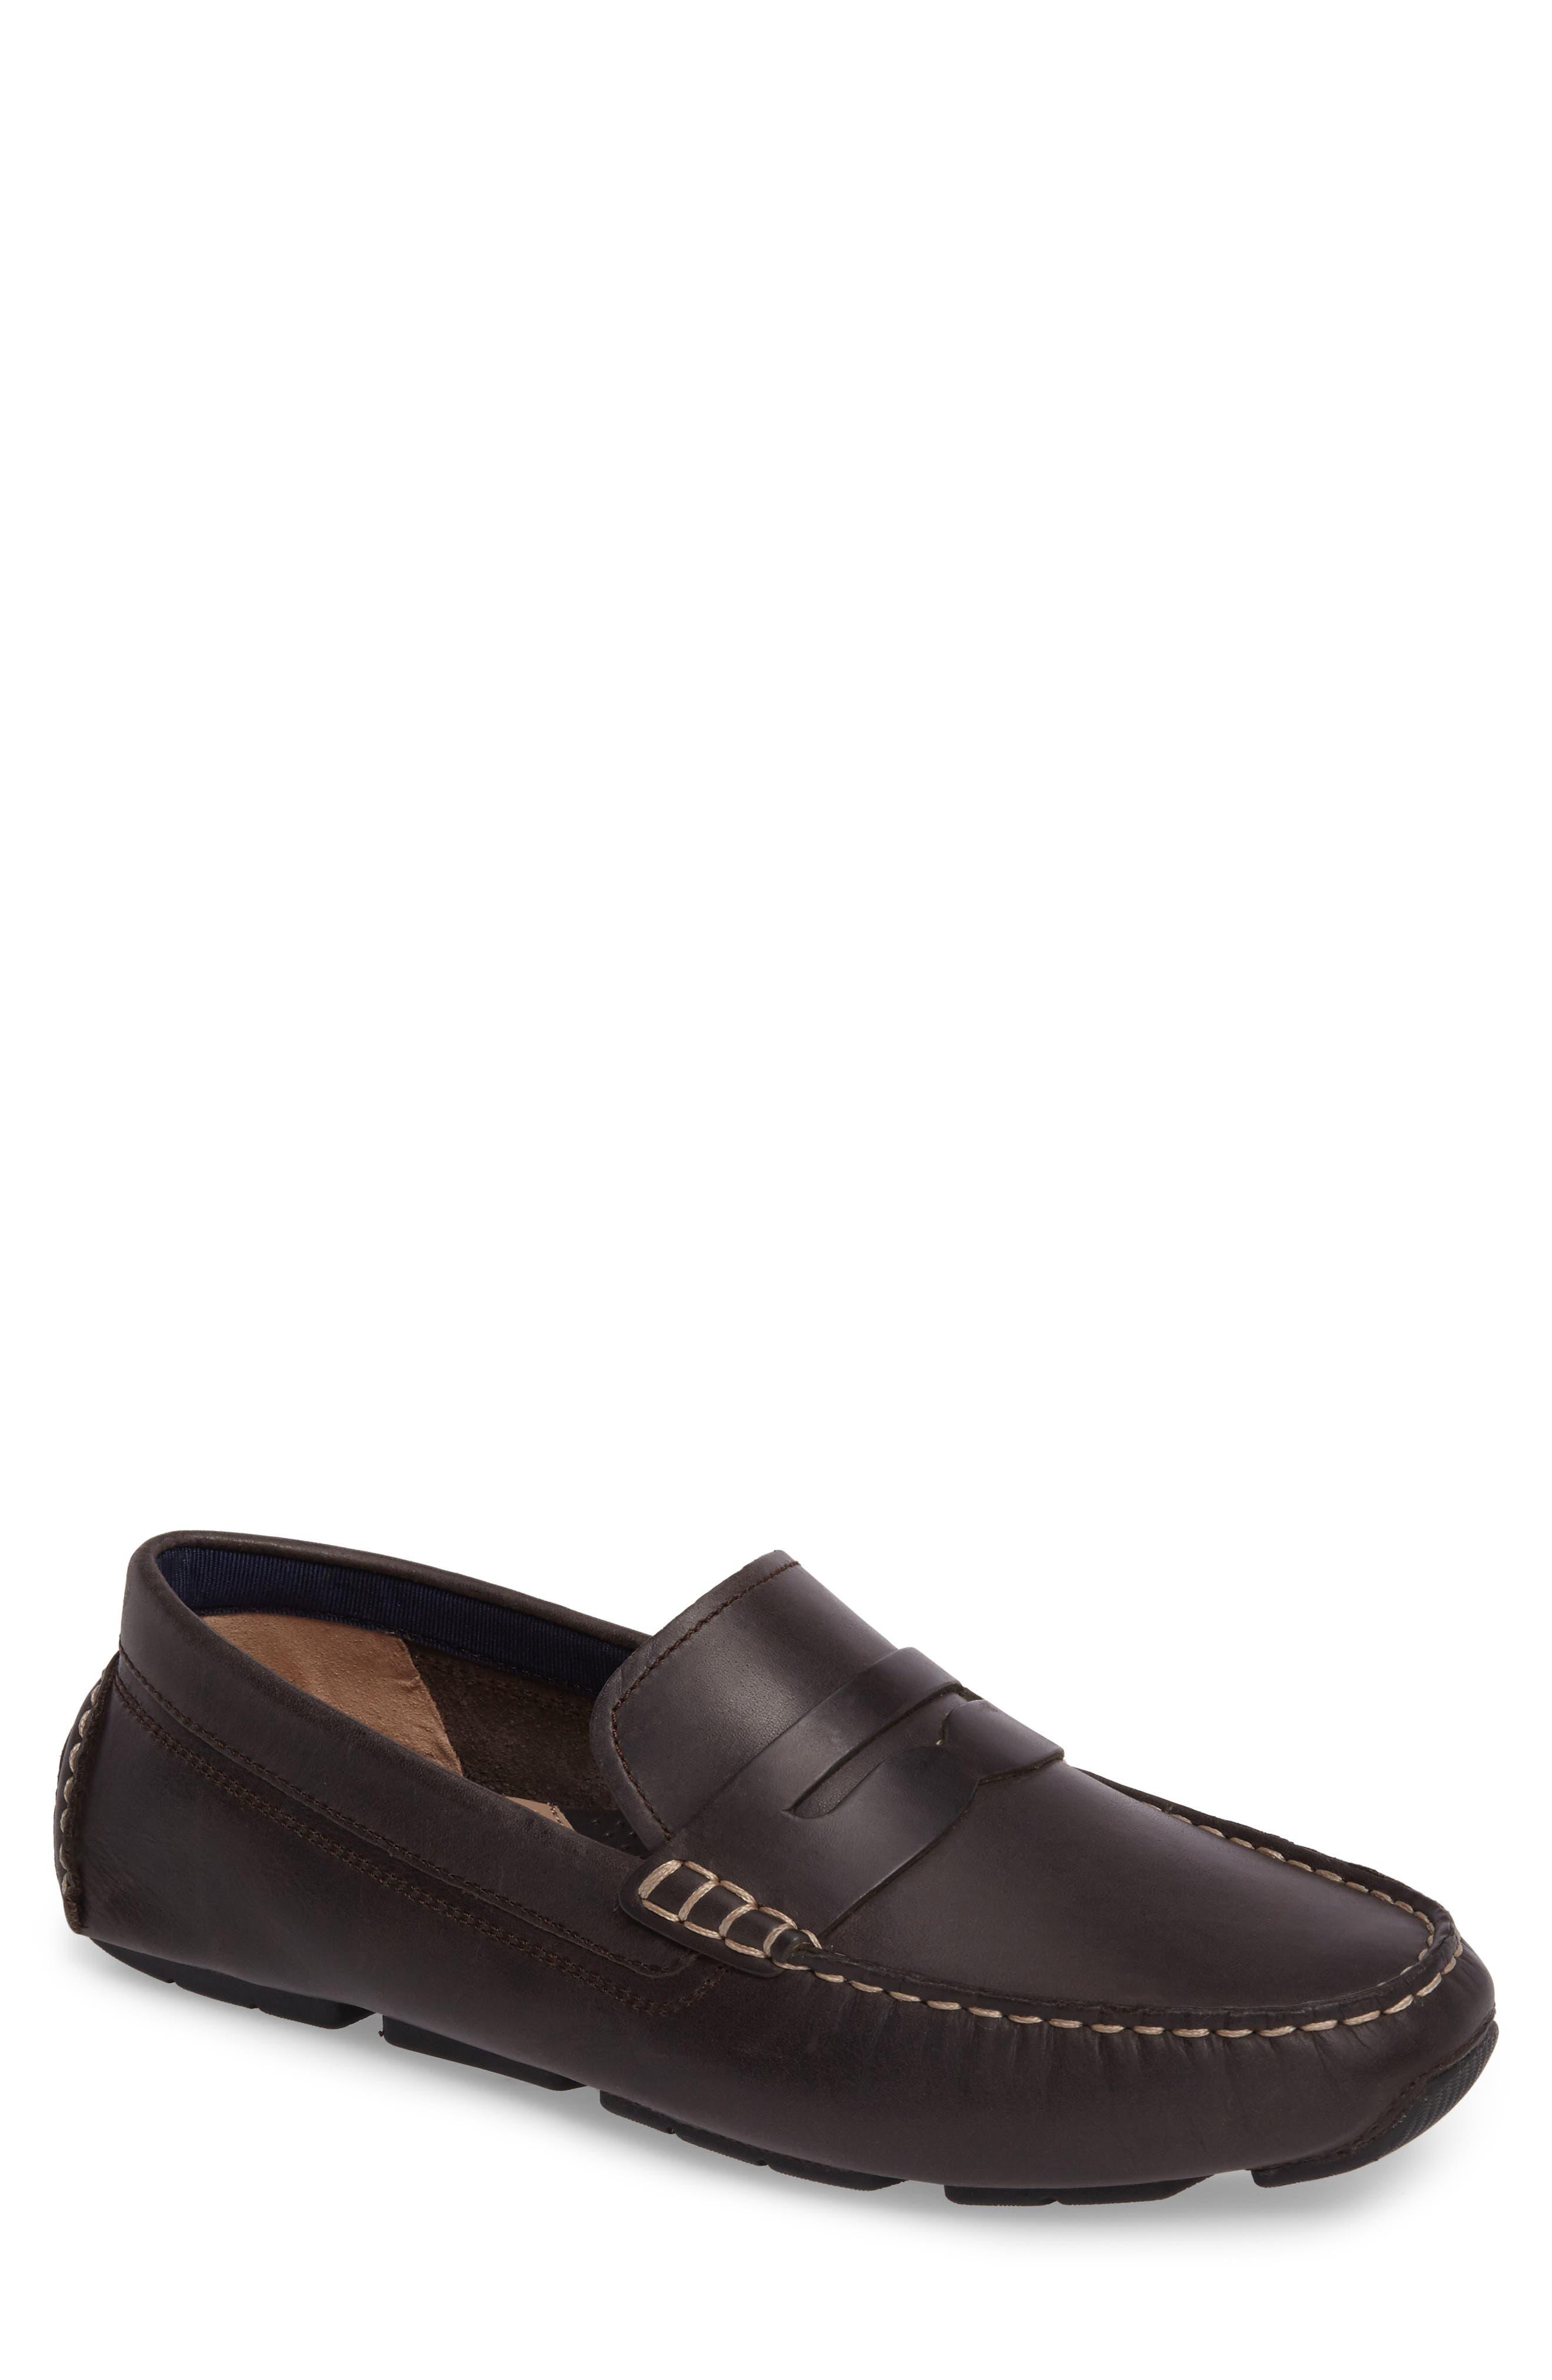 Alternate Image 1 Selected - Cole Haan Kelson Driving Shoe (Men)